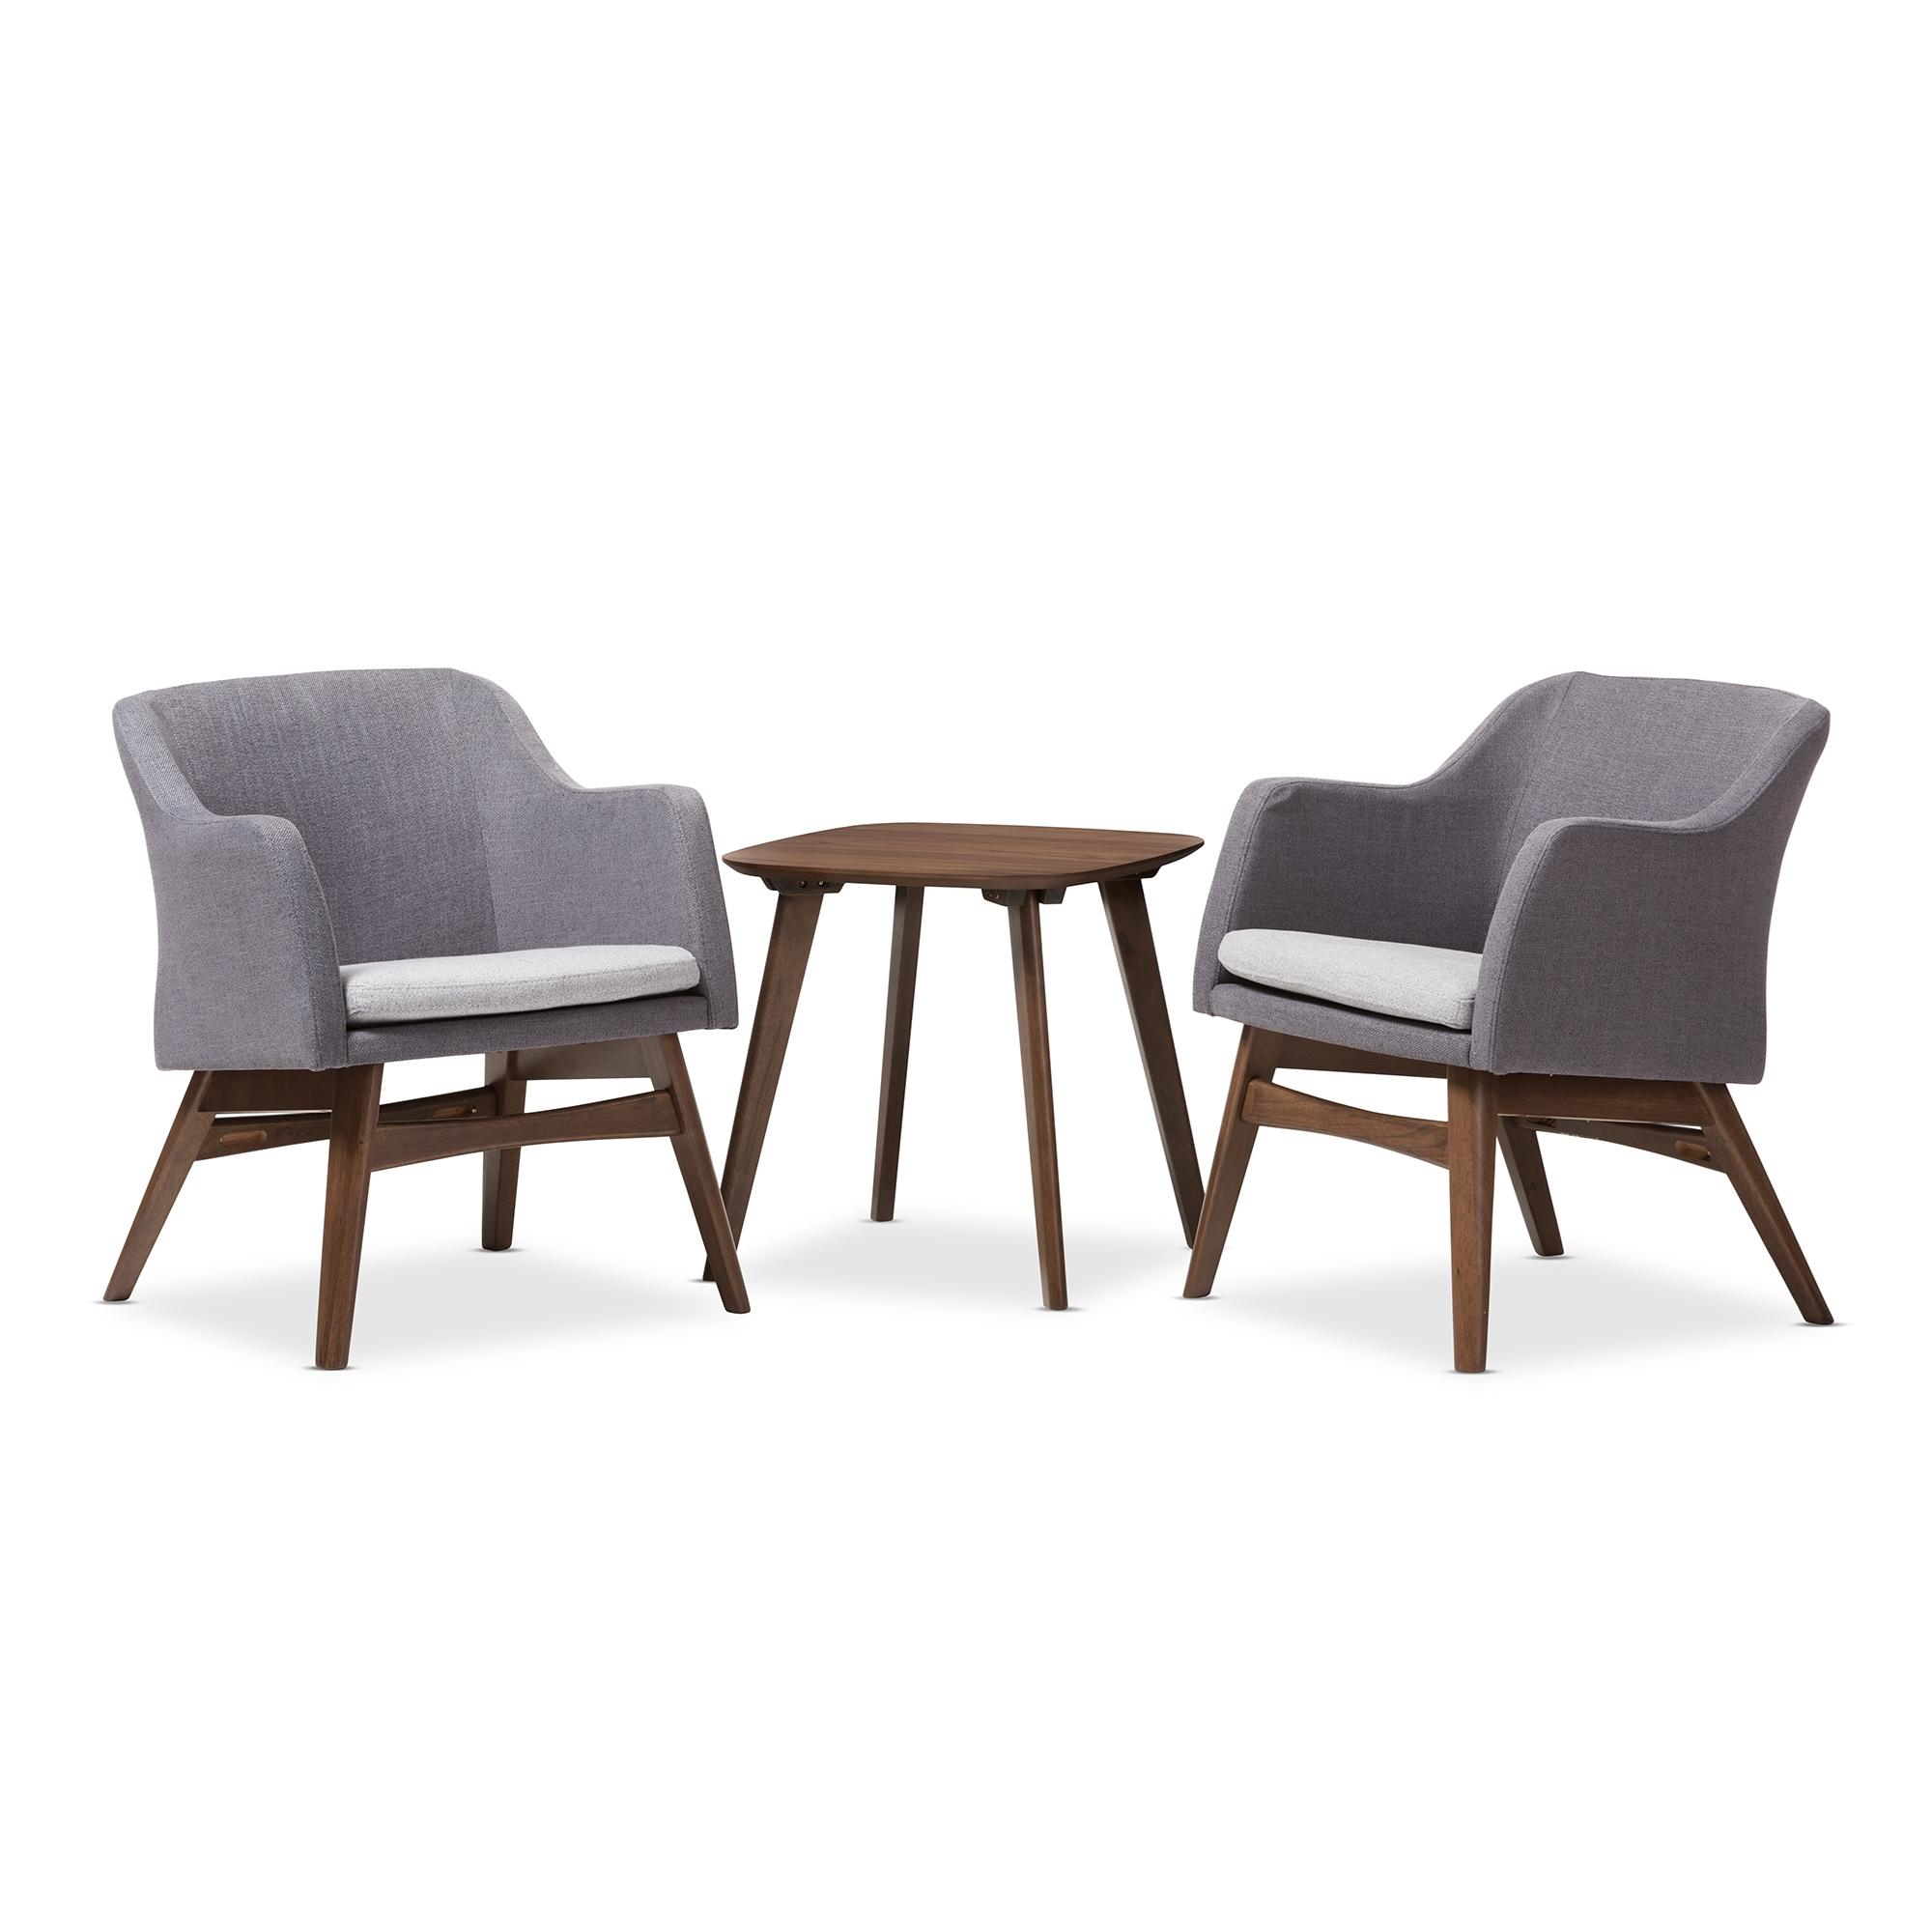 Baxton Studio Vera Mid Century Modern 3 Piece Lounge Chair And Side Table  Set